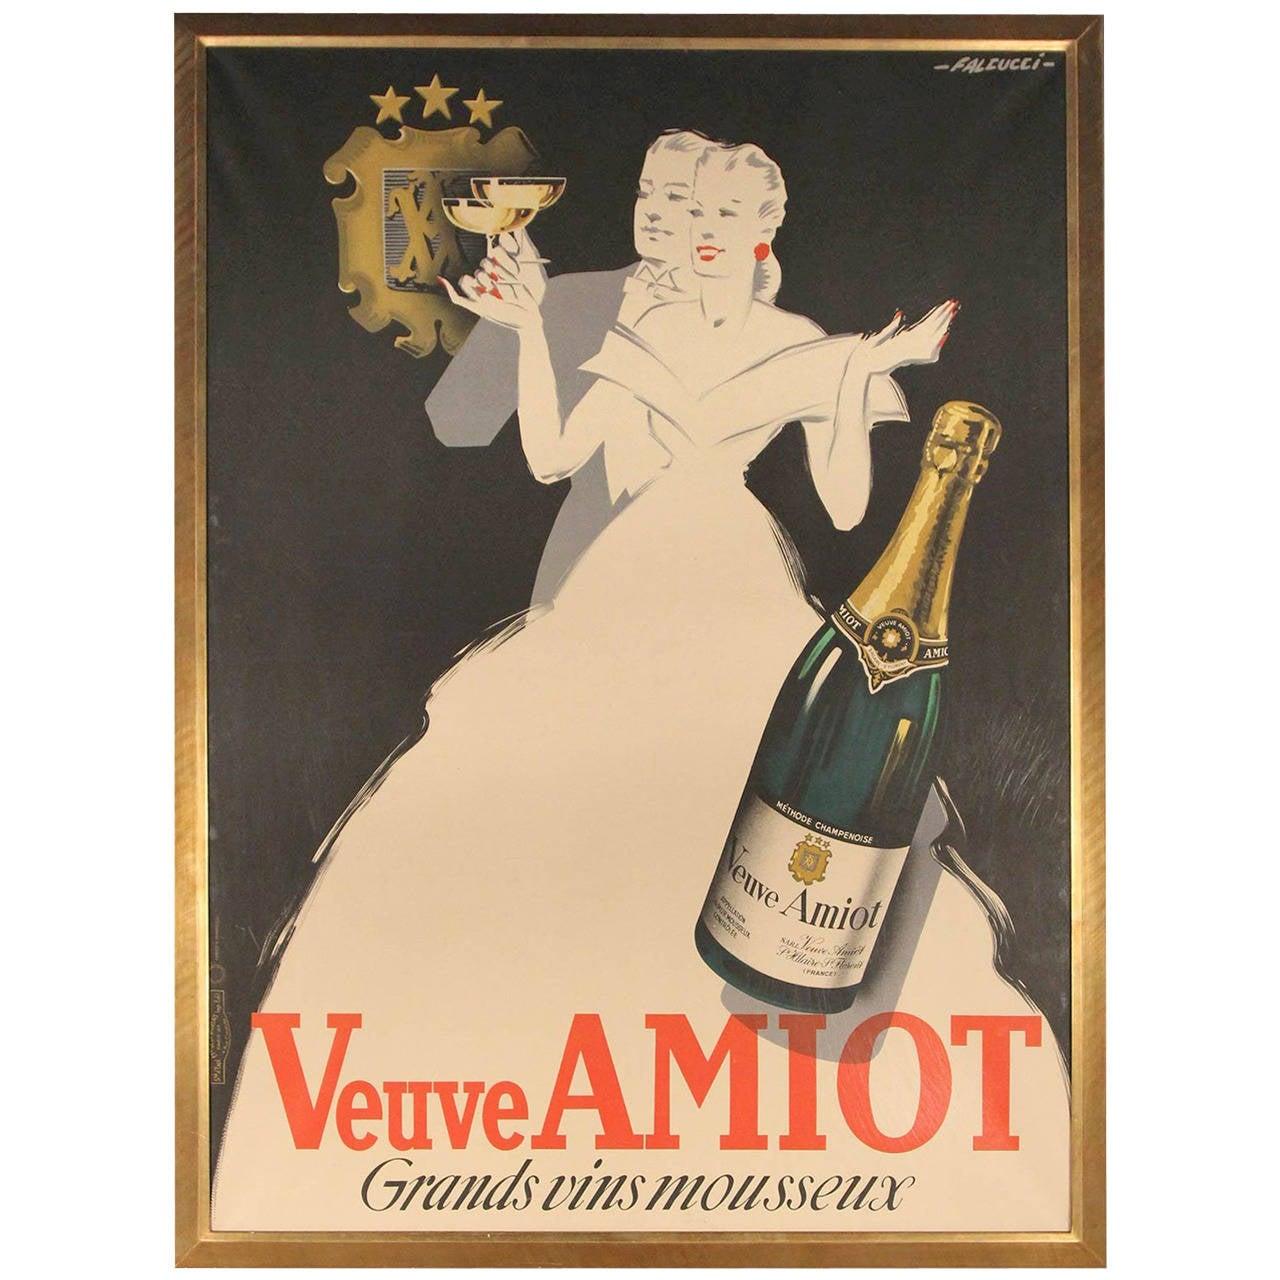 Veuve Amiot Champagne French Poster Framed At 1stdibs